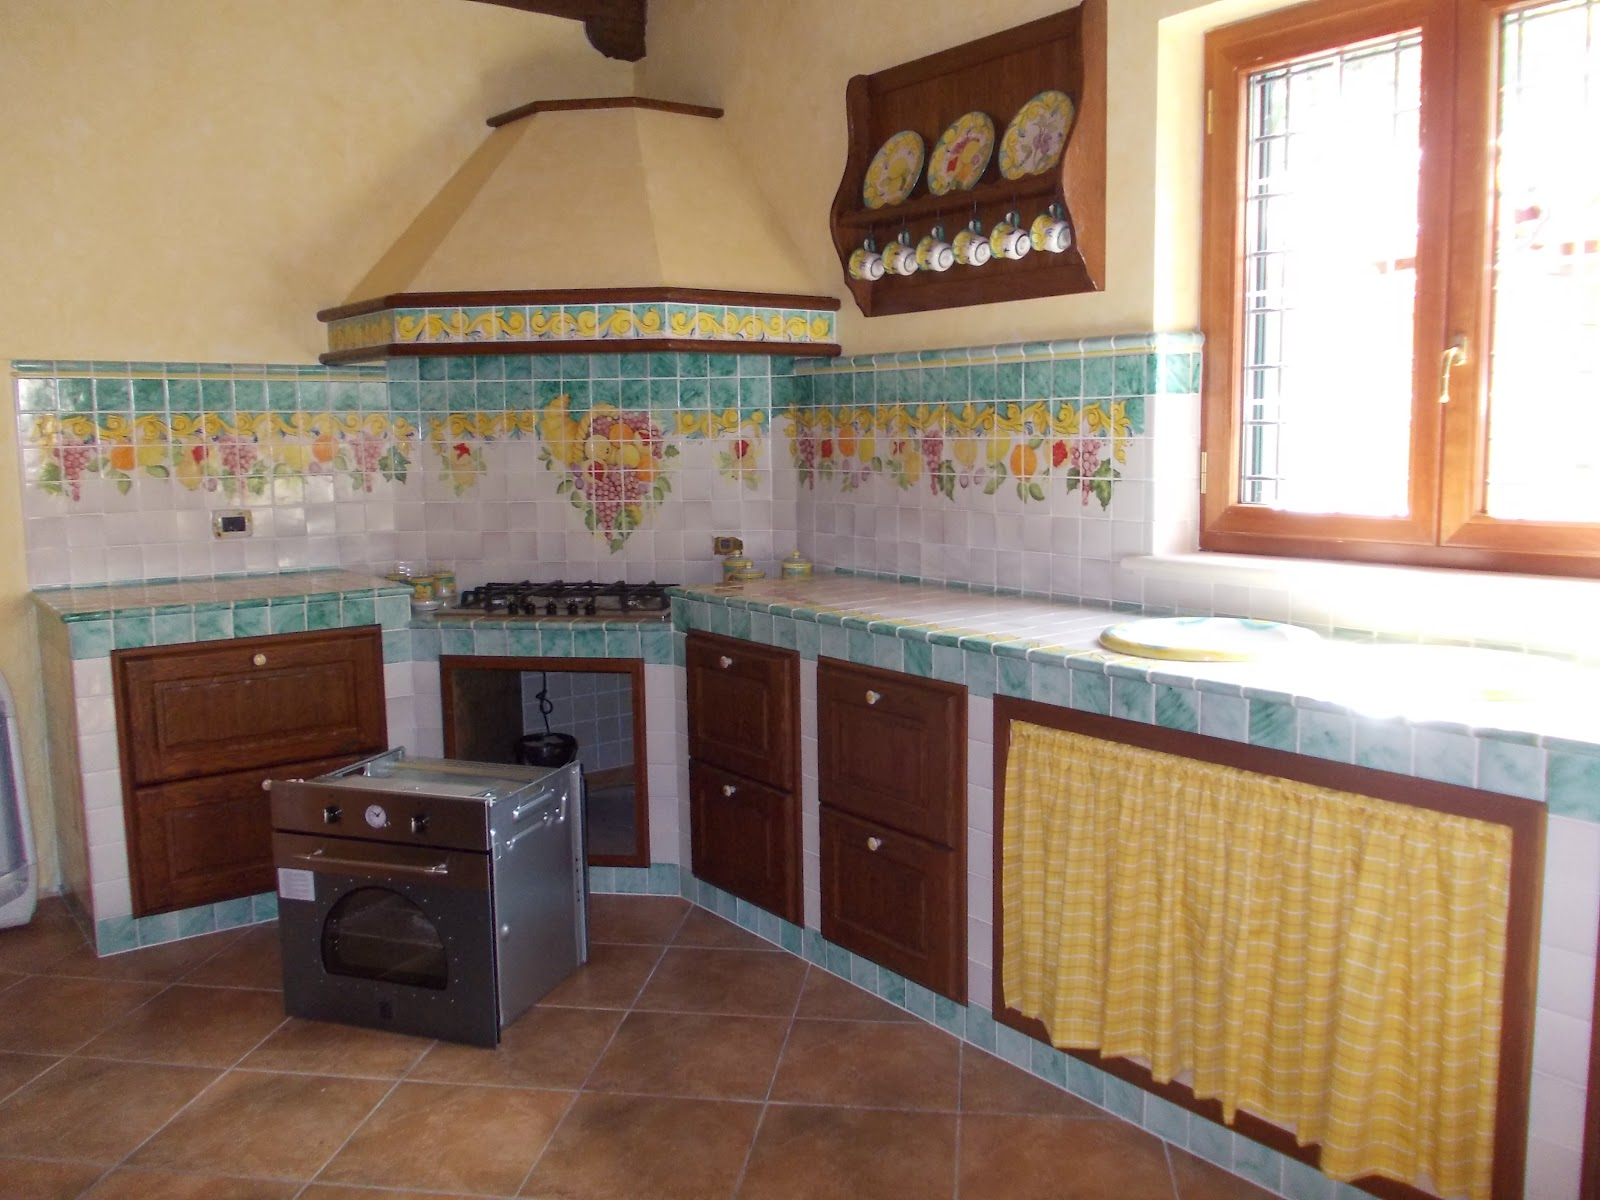 Foto Cucine In Muratura Da Esterno. Panchine Da Giardino In ...